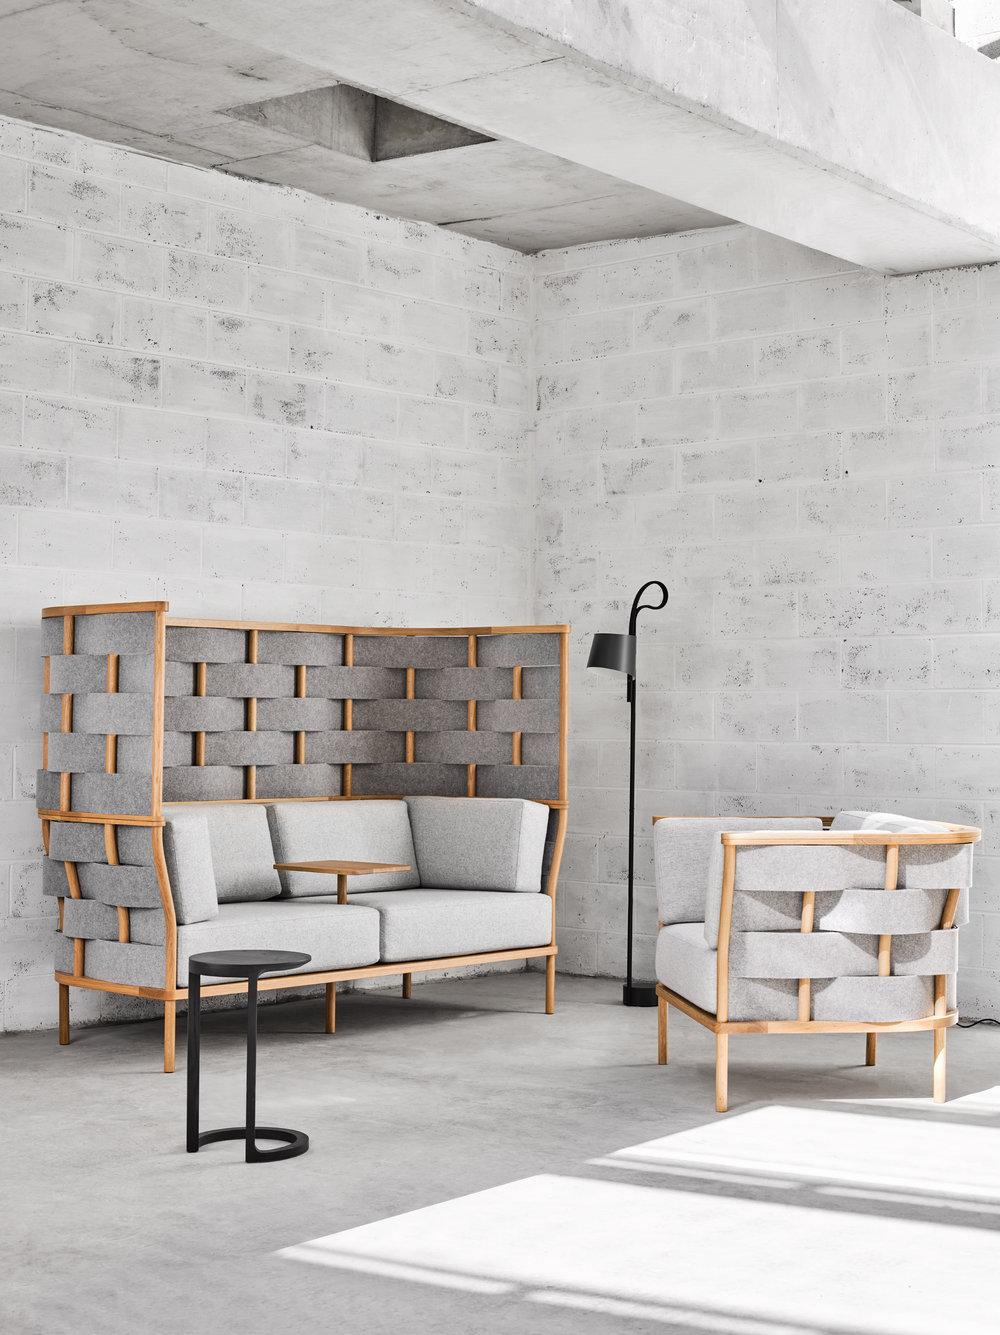 Bower designed by Adam Goodrum for  NAU . Styling - Marsha Golemac, photo - Dan Hocking.